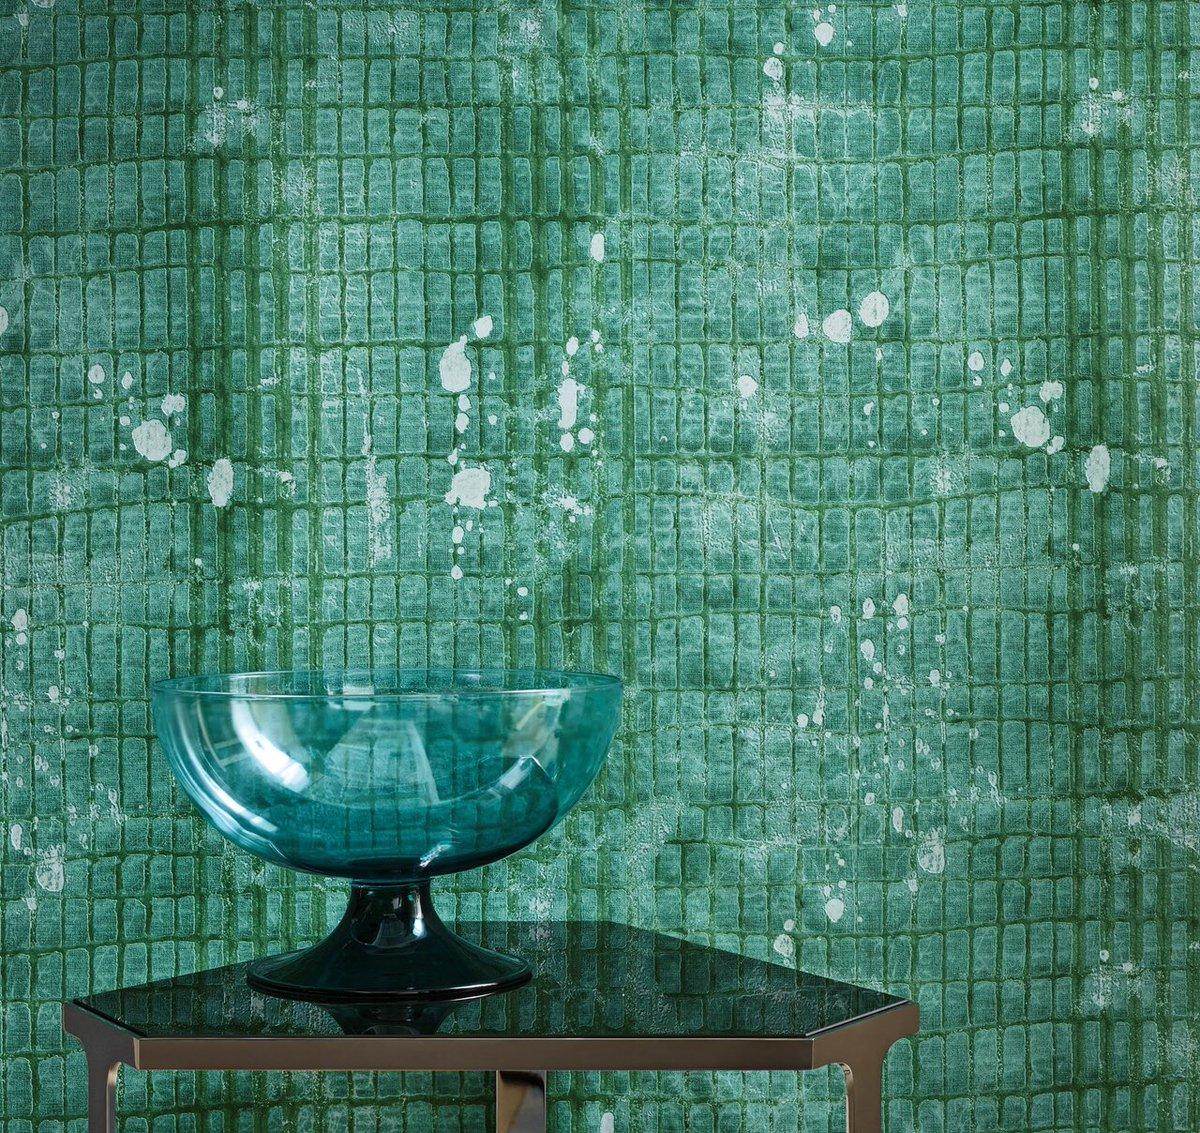 Wall&amp;deco Essential Collection  #cartadaparati #cartedaparati #wallanddeco #papierpeint #wallpaper #tapete #papelpintado #wallcovering #newcollection #2017collection #2017essentialwallpaper #newexpressionsforinteriordecoration#imodernillc #imiresource #letusbeyourresource<br>http://pic.twitter.com/m9kCGoejXN